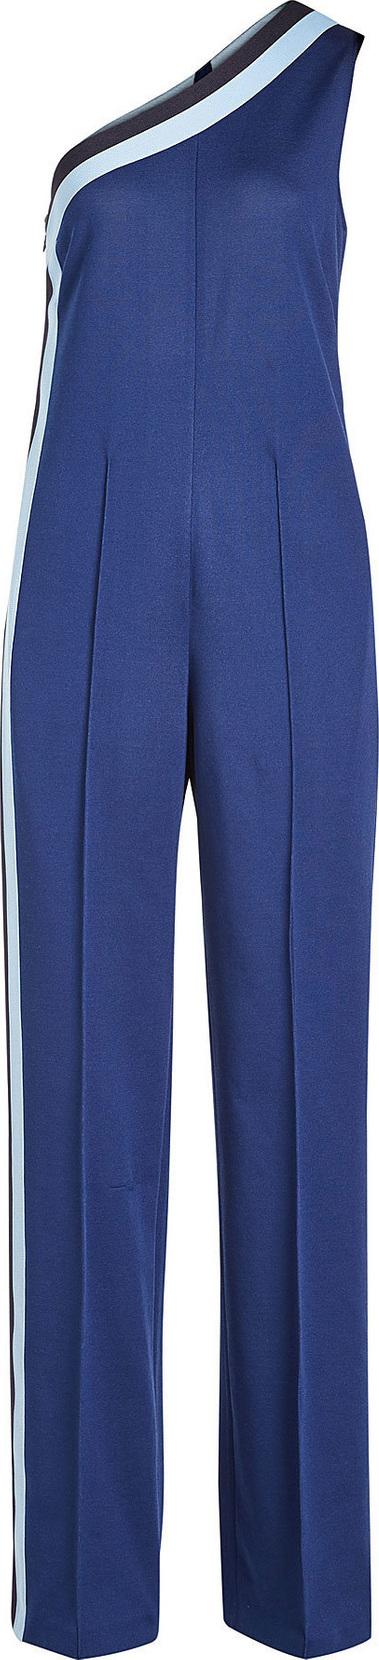 Golden Goose Deluxe Brand Paloma Asymmetric Jumpsuit